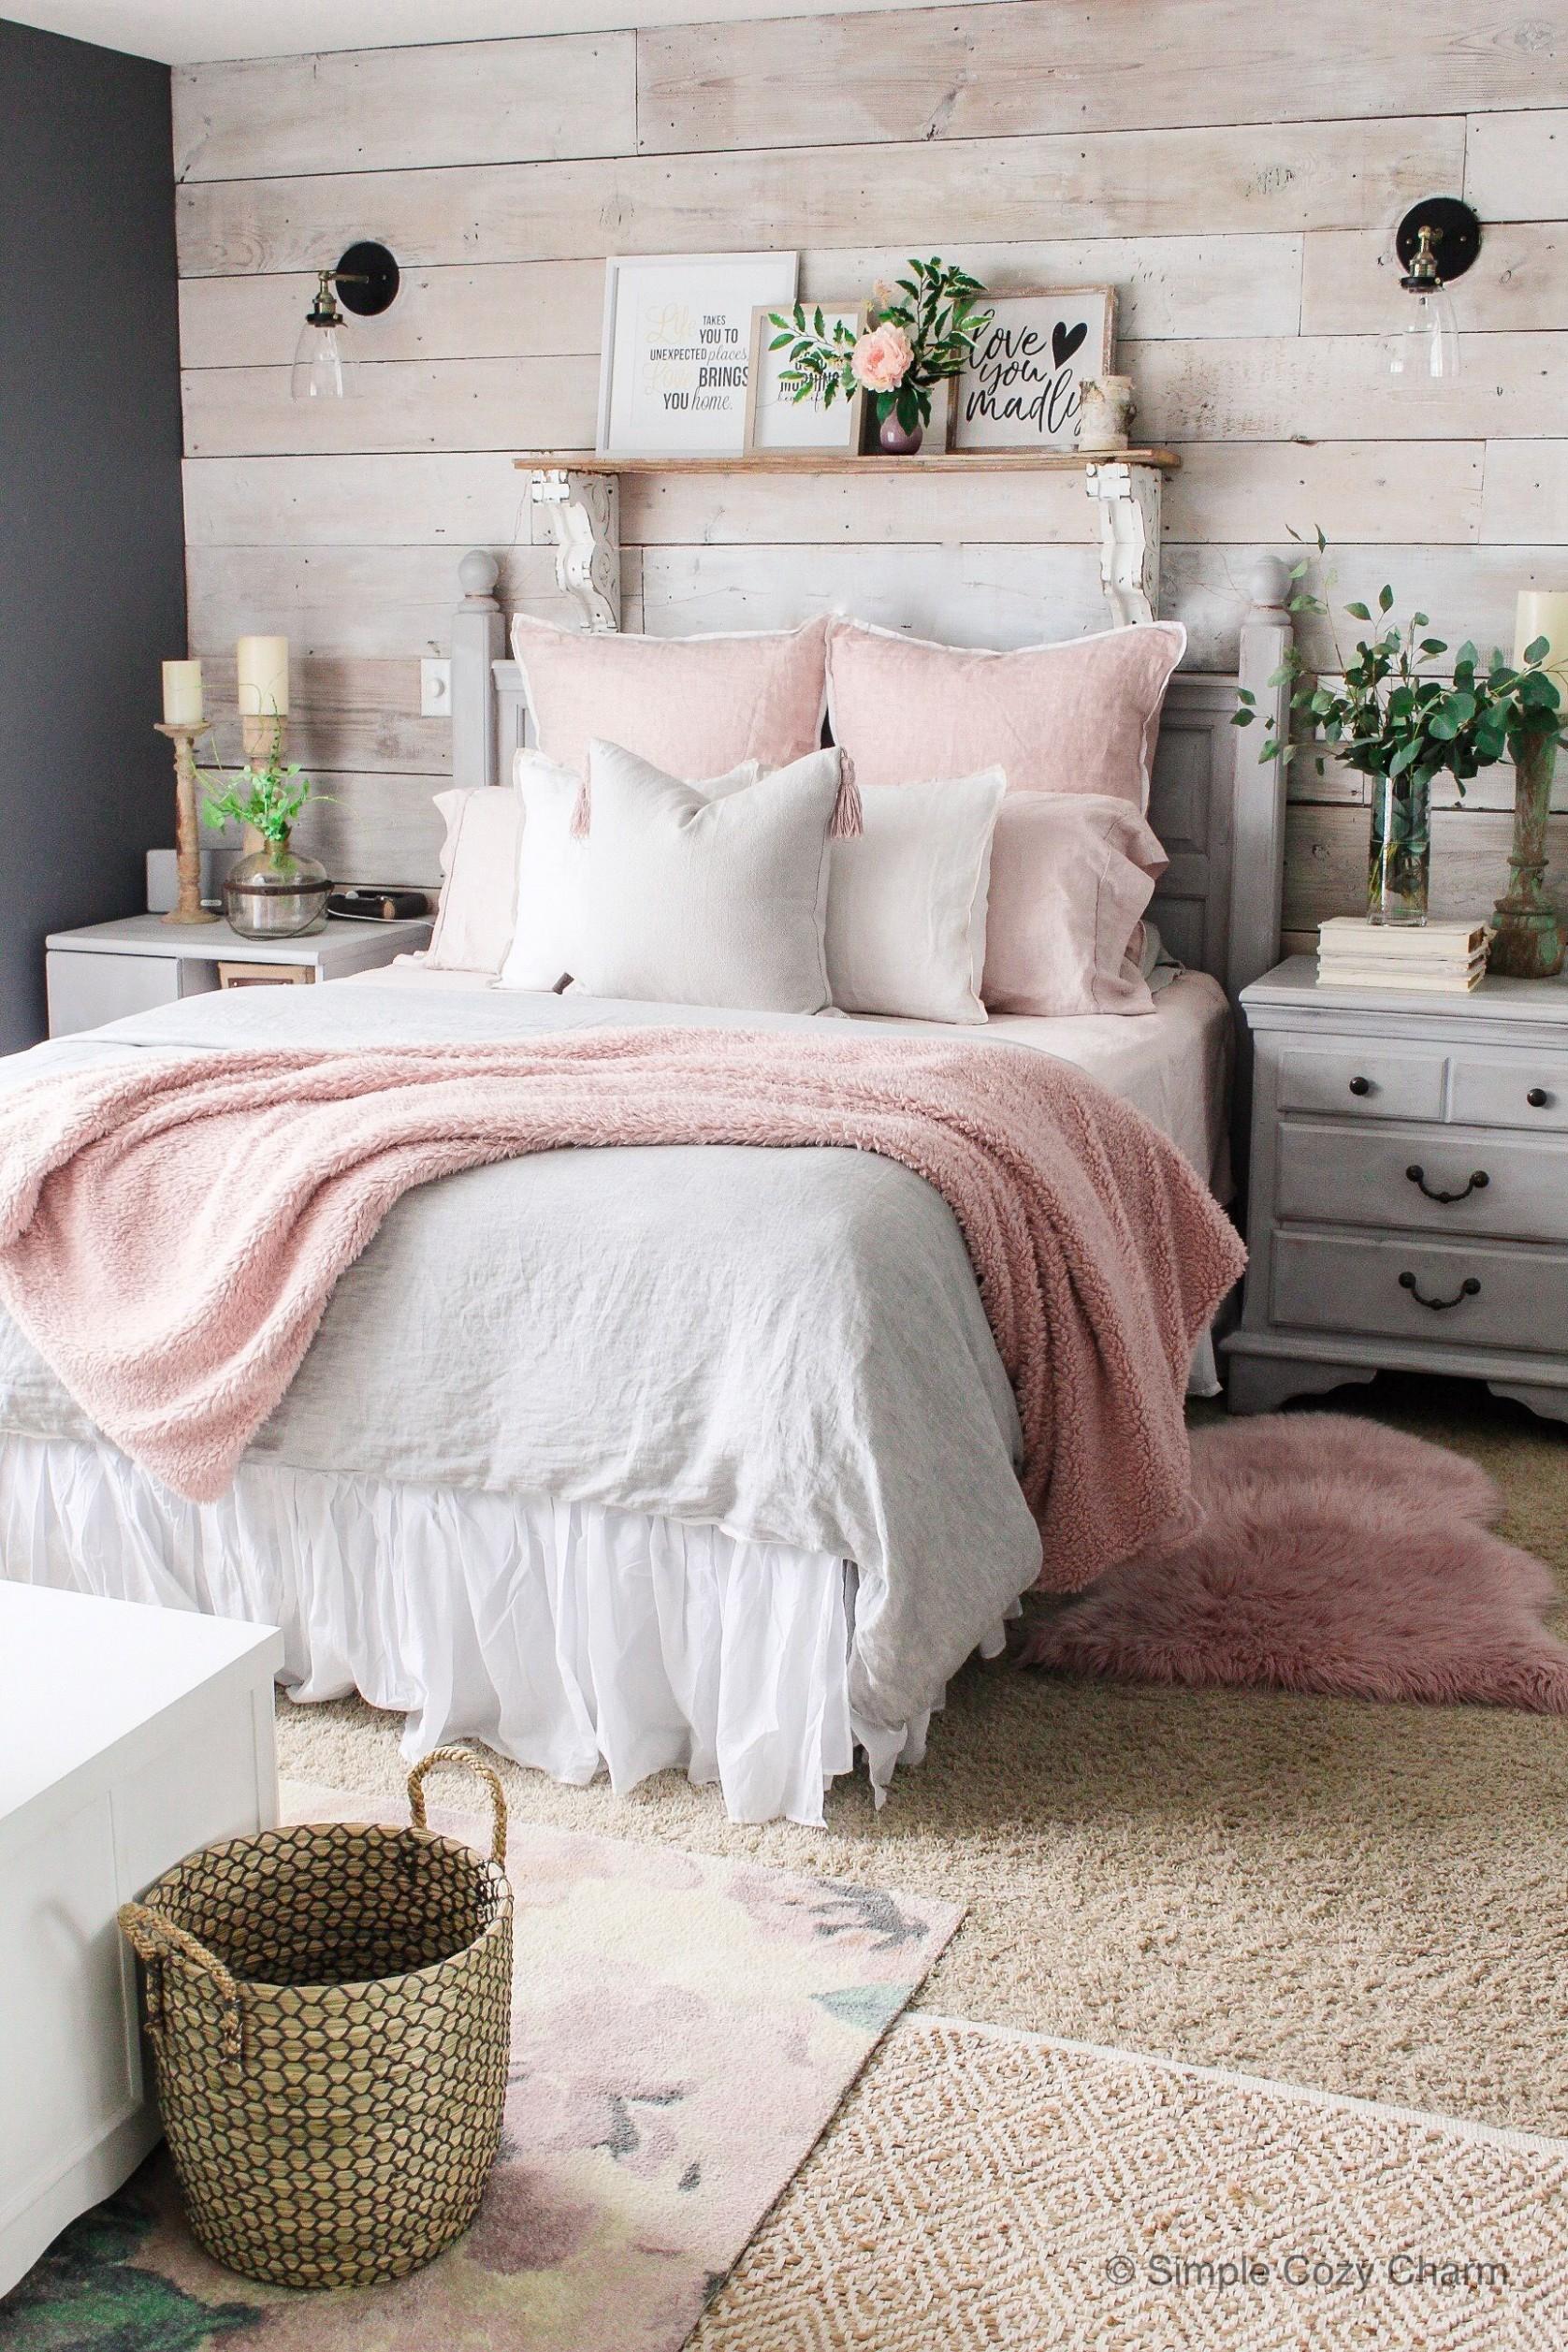 Mid-Winter Bedroom Facelift - Simple Cozy Charm  Bedroom refresh  - Cute Bedroom Ideas